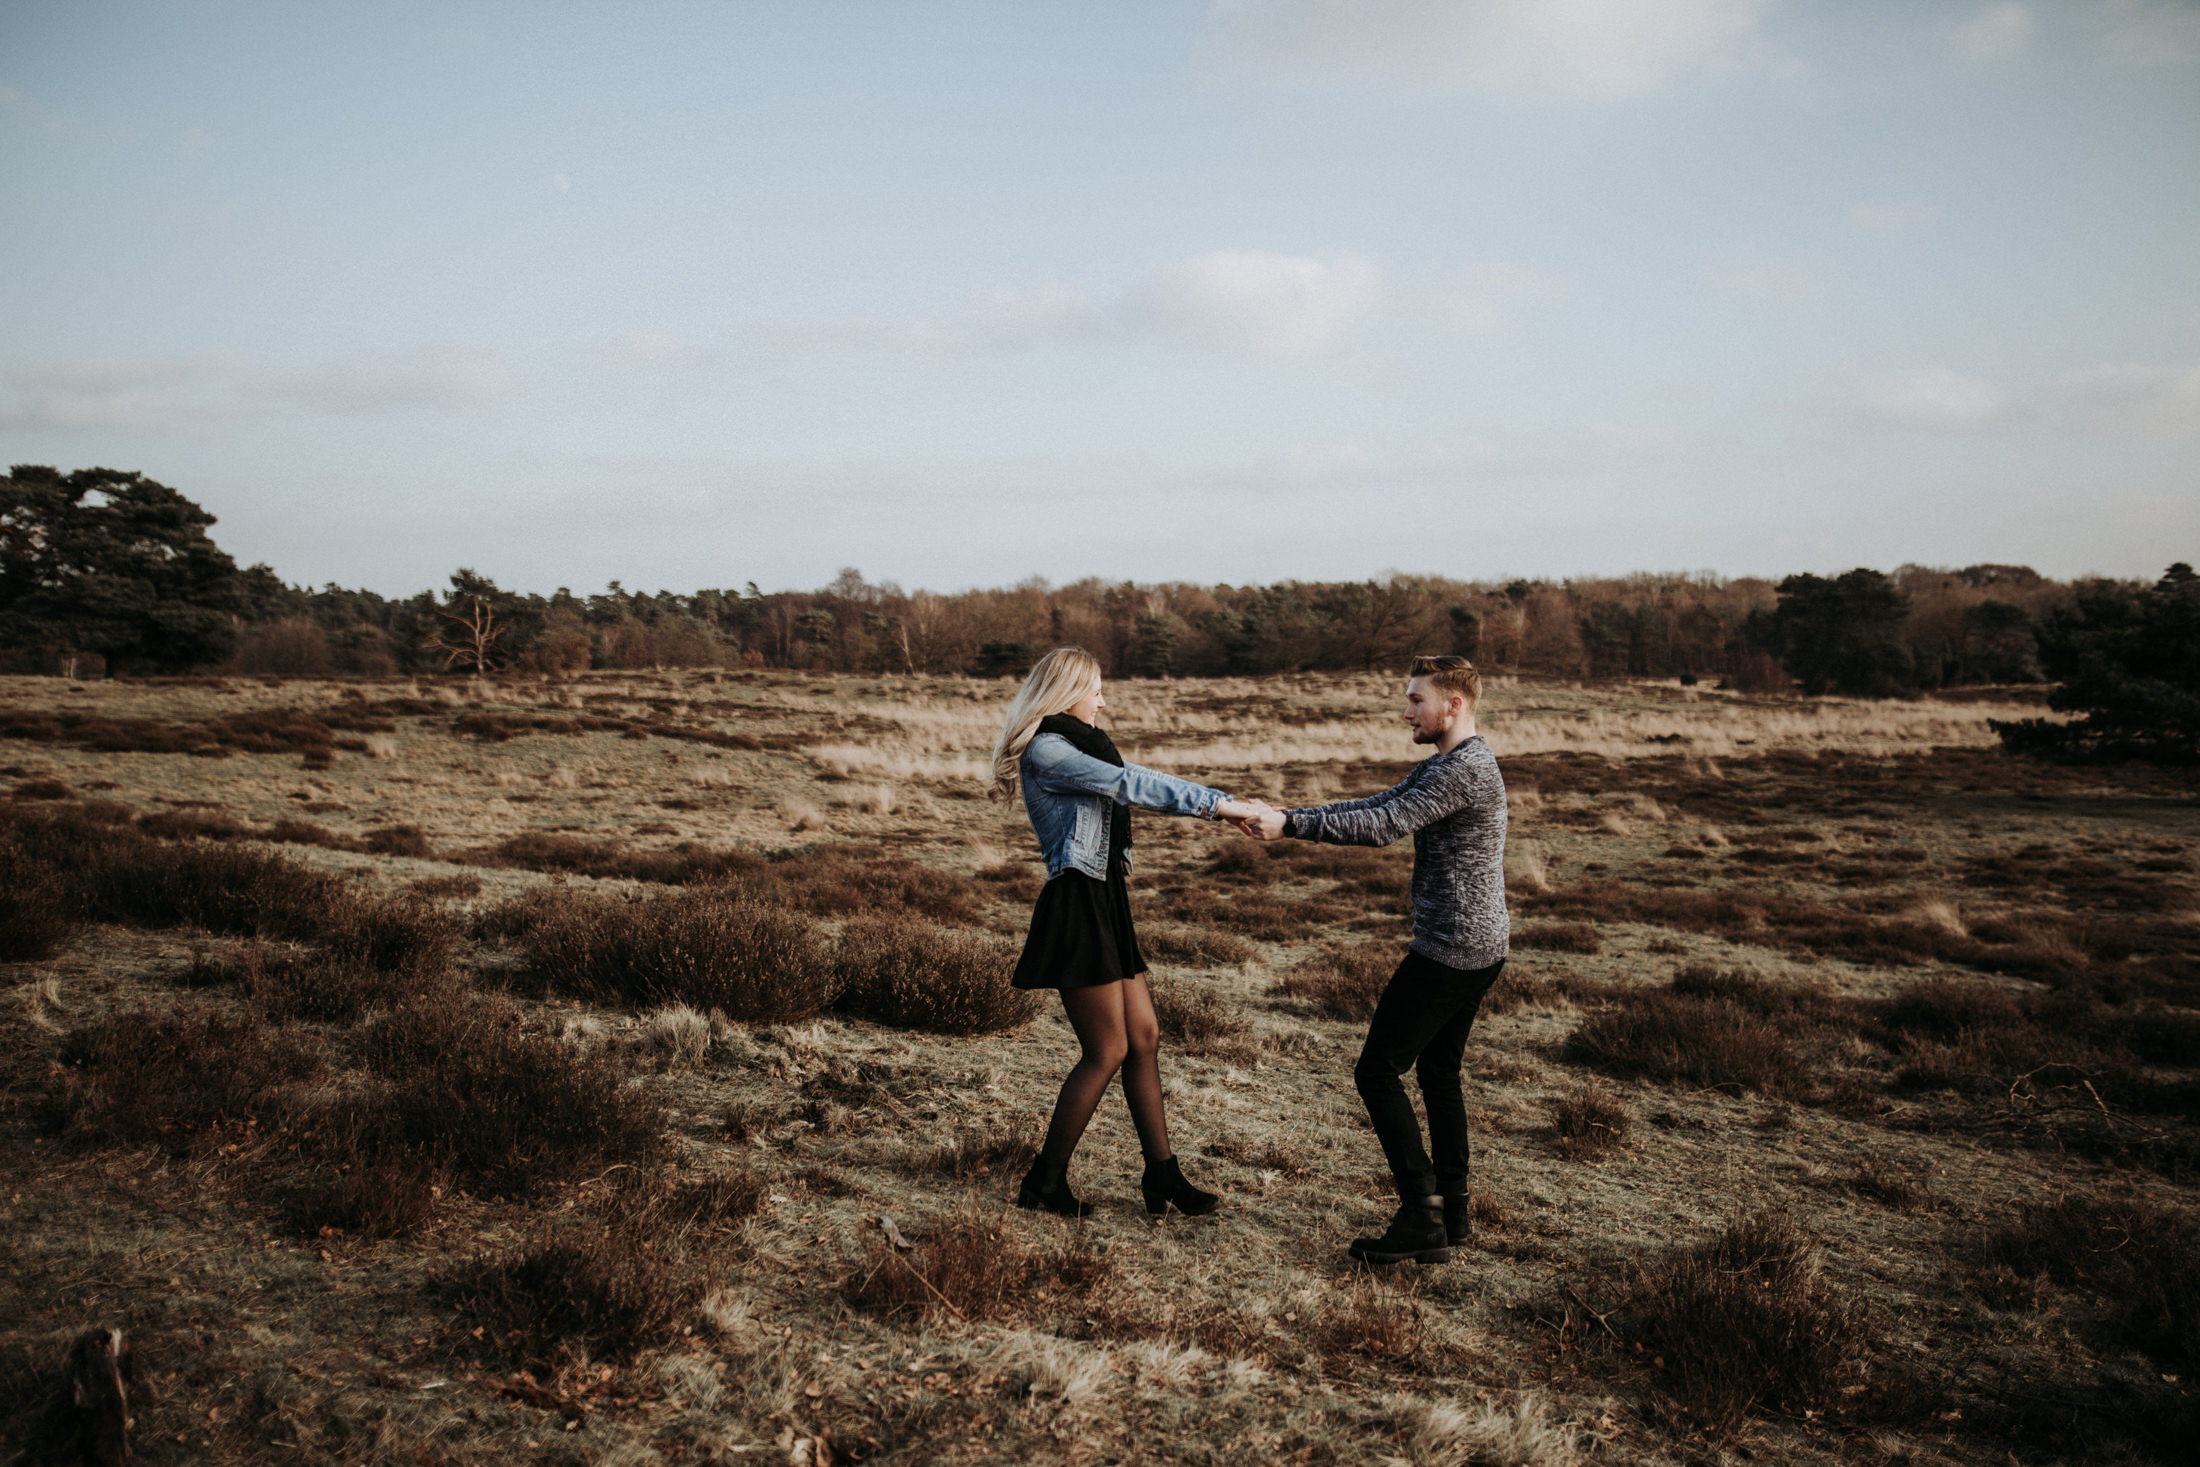 Wedding_Photographer_Mallorca_Daniela-Marquardt_Photography_CanaryIslands_Lanzarote_Iceland_Tuskany_Santorini_Portugal__Austria_Elopement_Hochzeitsfotograf_Milena_Marvin_9